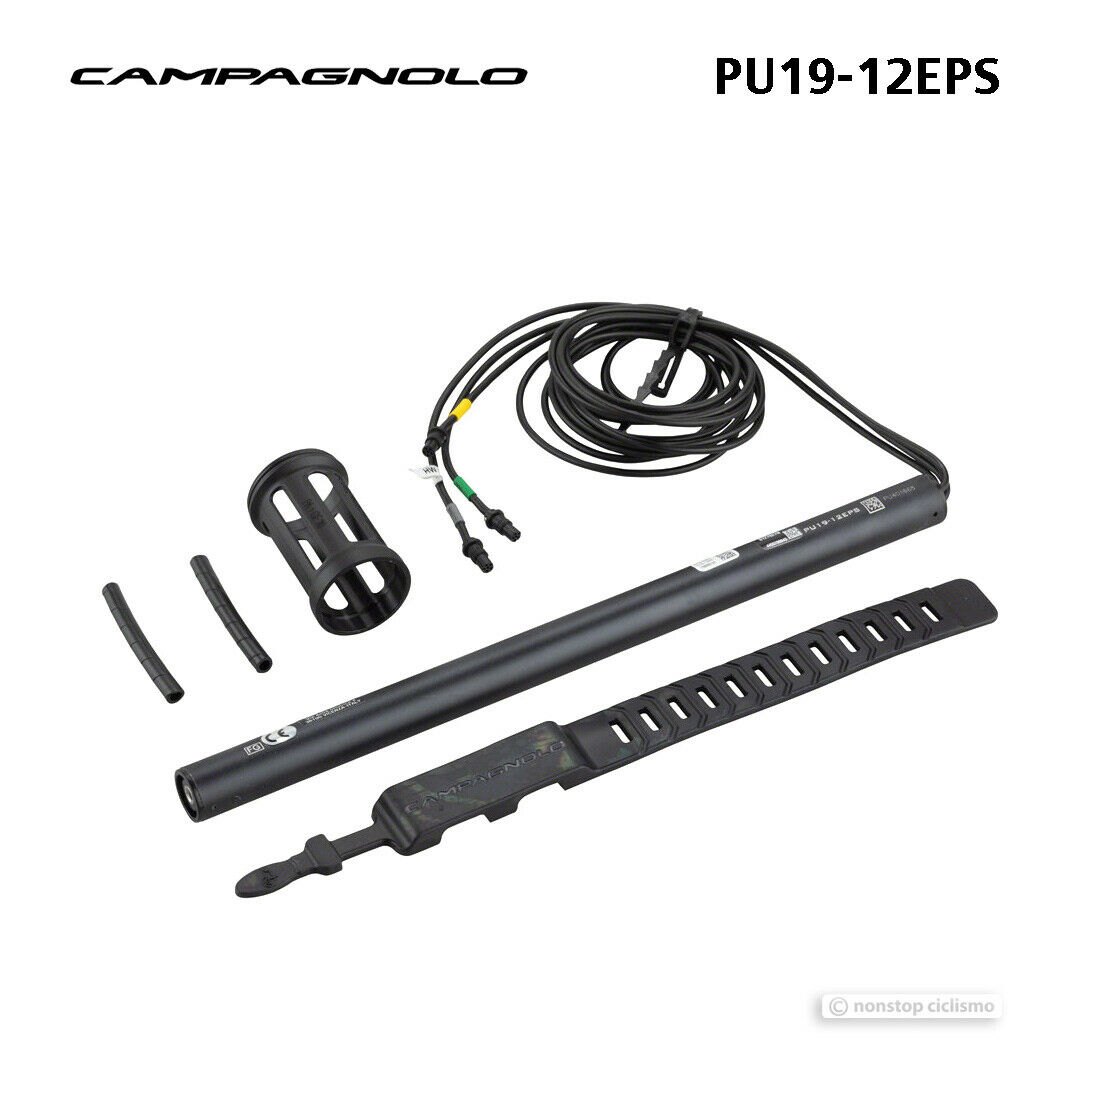 Campagnolo 2019 Eps V4 12-speed Power Einheit  Pu19-12eps